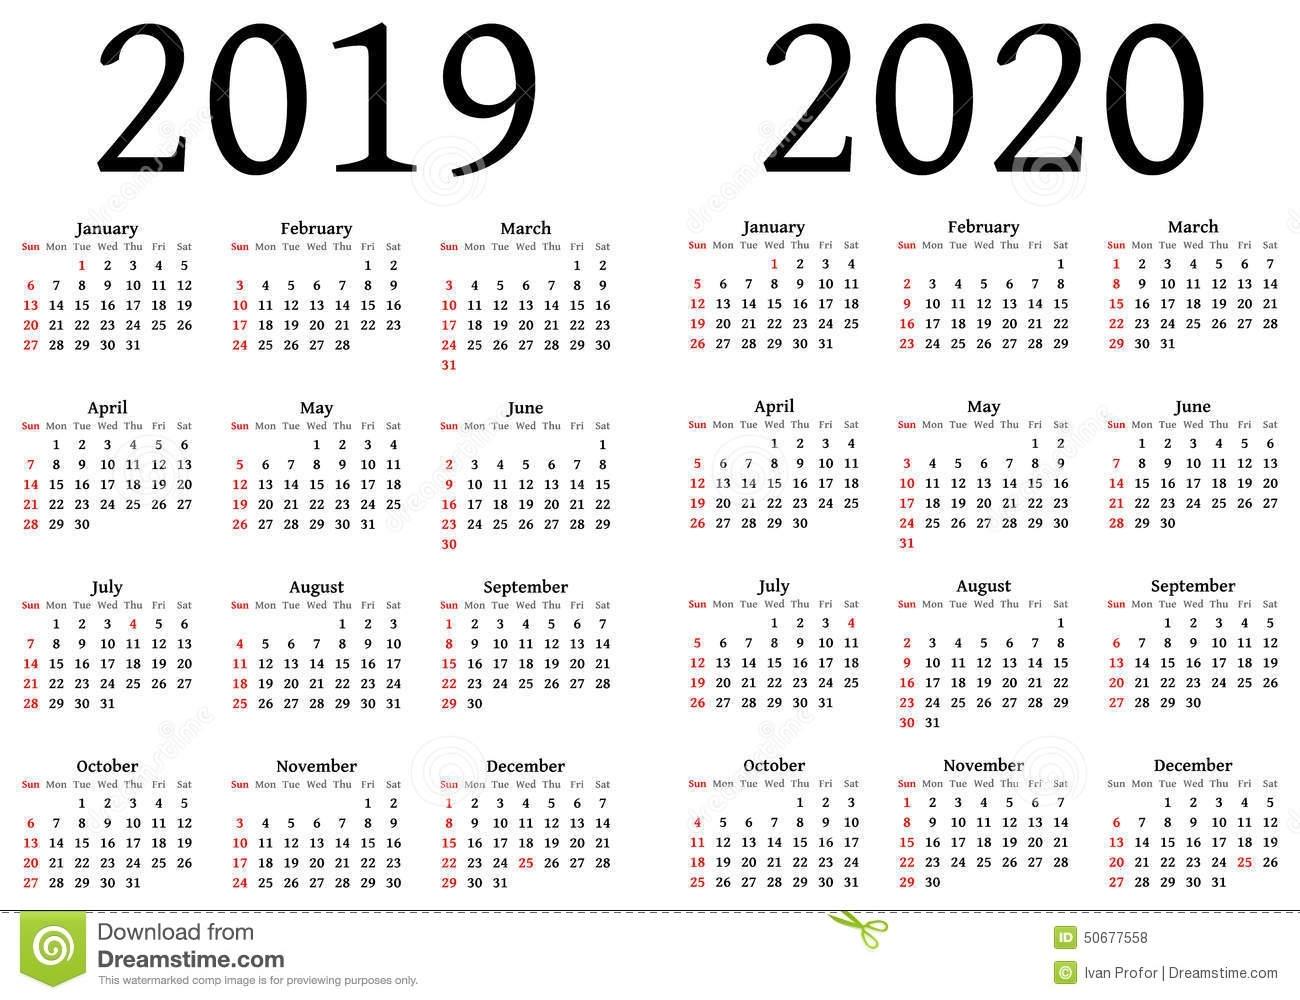 Printable Calendar For 2019 And 2020 | Printable Calendar 2019 in 2019-2020 Printable Calendar One Page